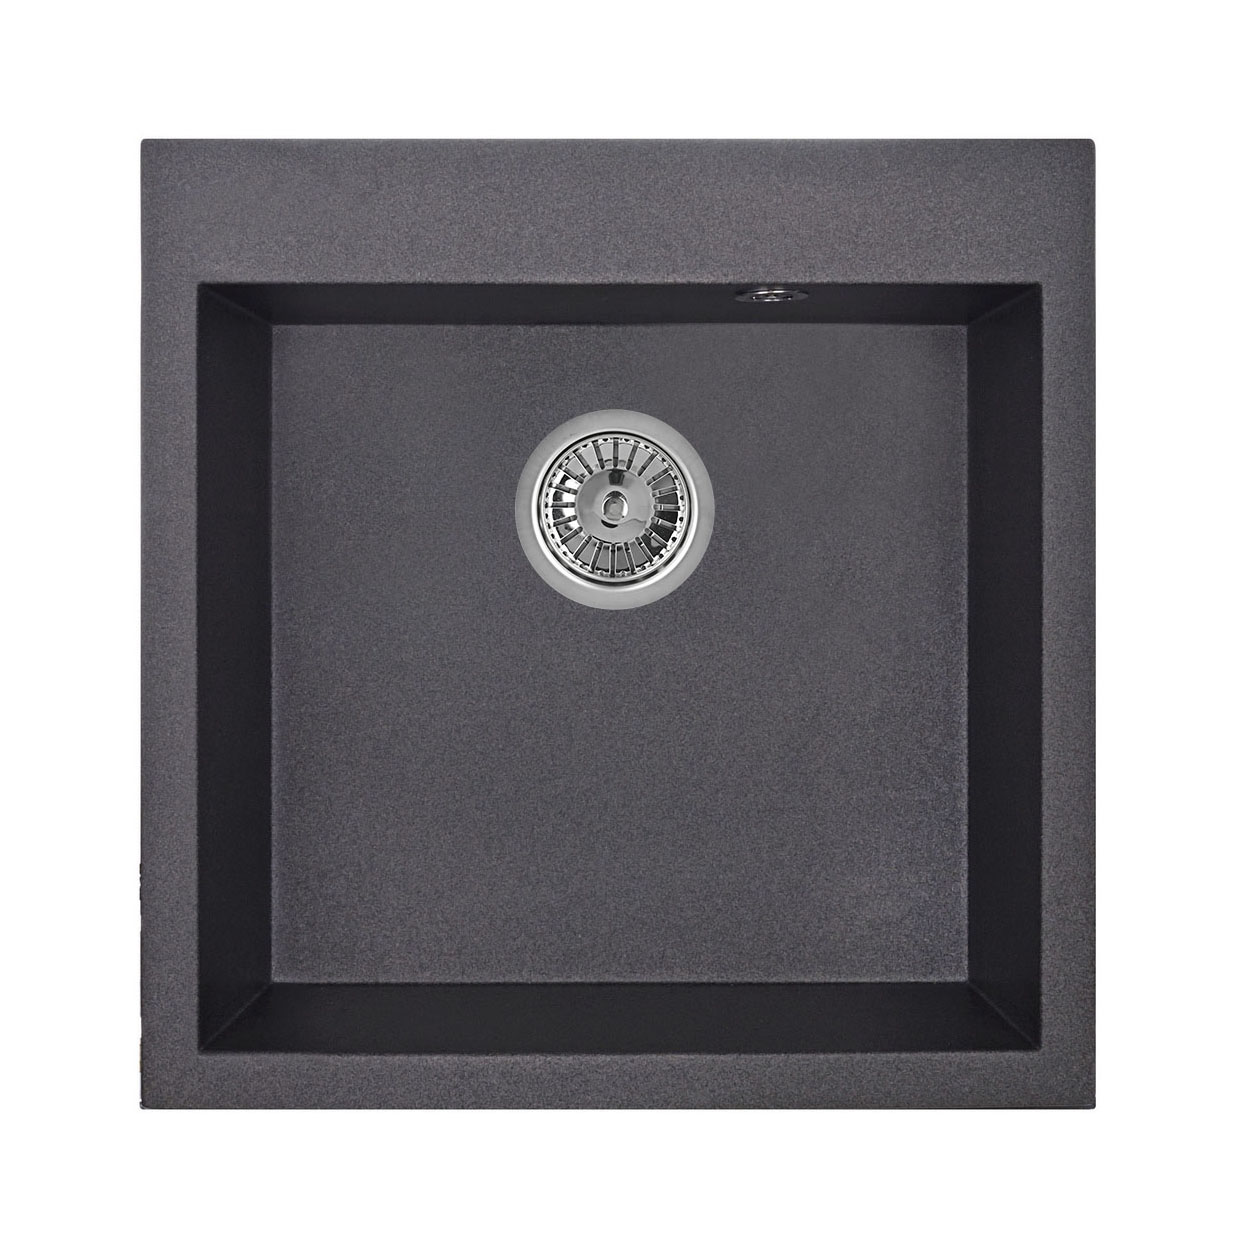 Кухонная мойка Granula GR-5102 505х510 черный цена